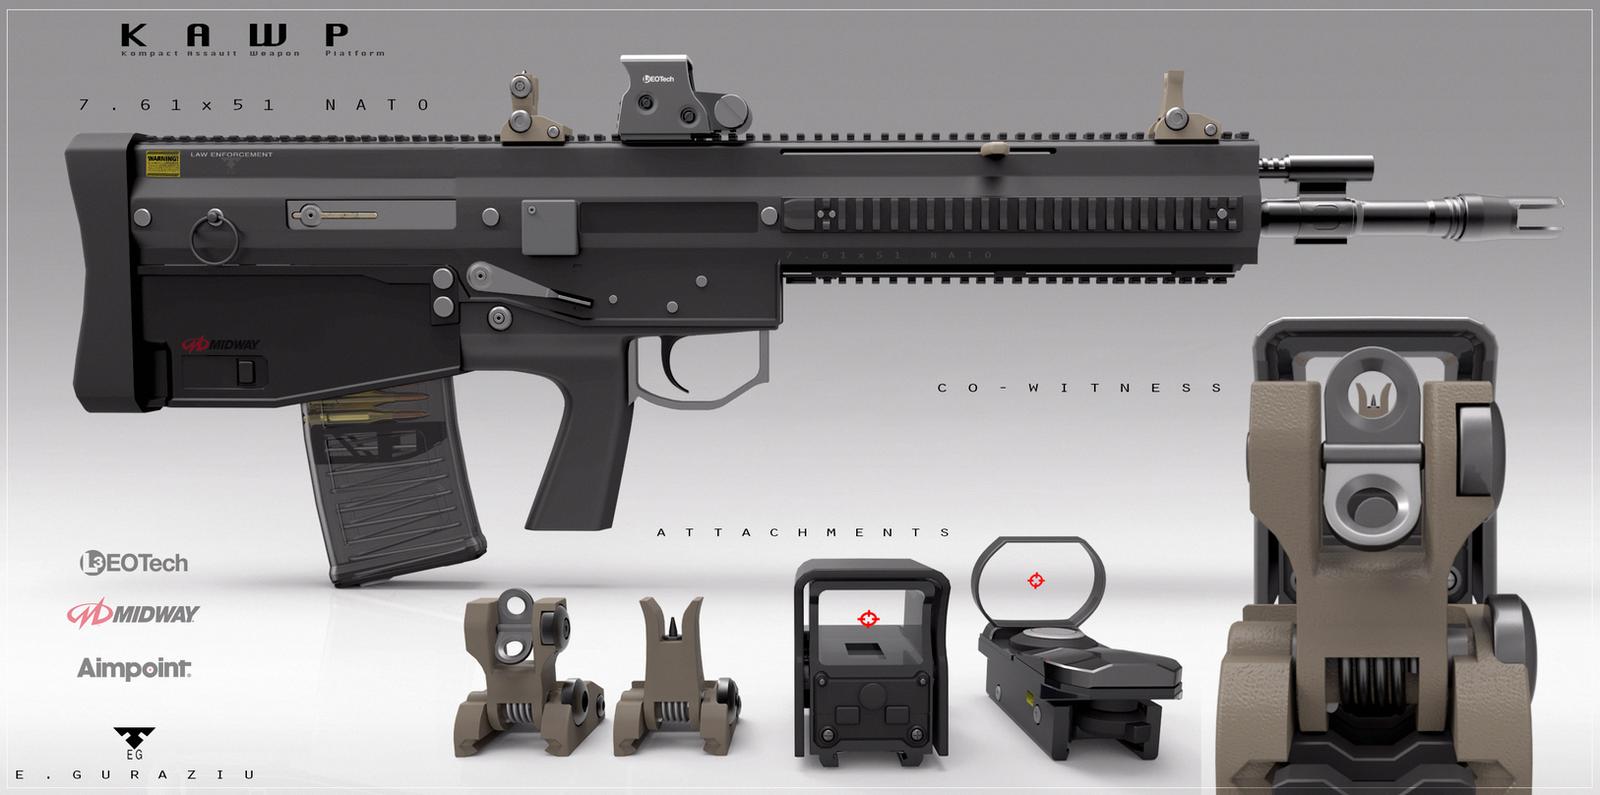 KAWP  Concept Design by EdonGuraziu